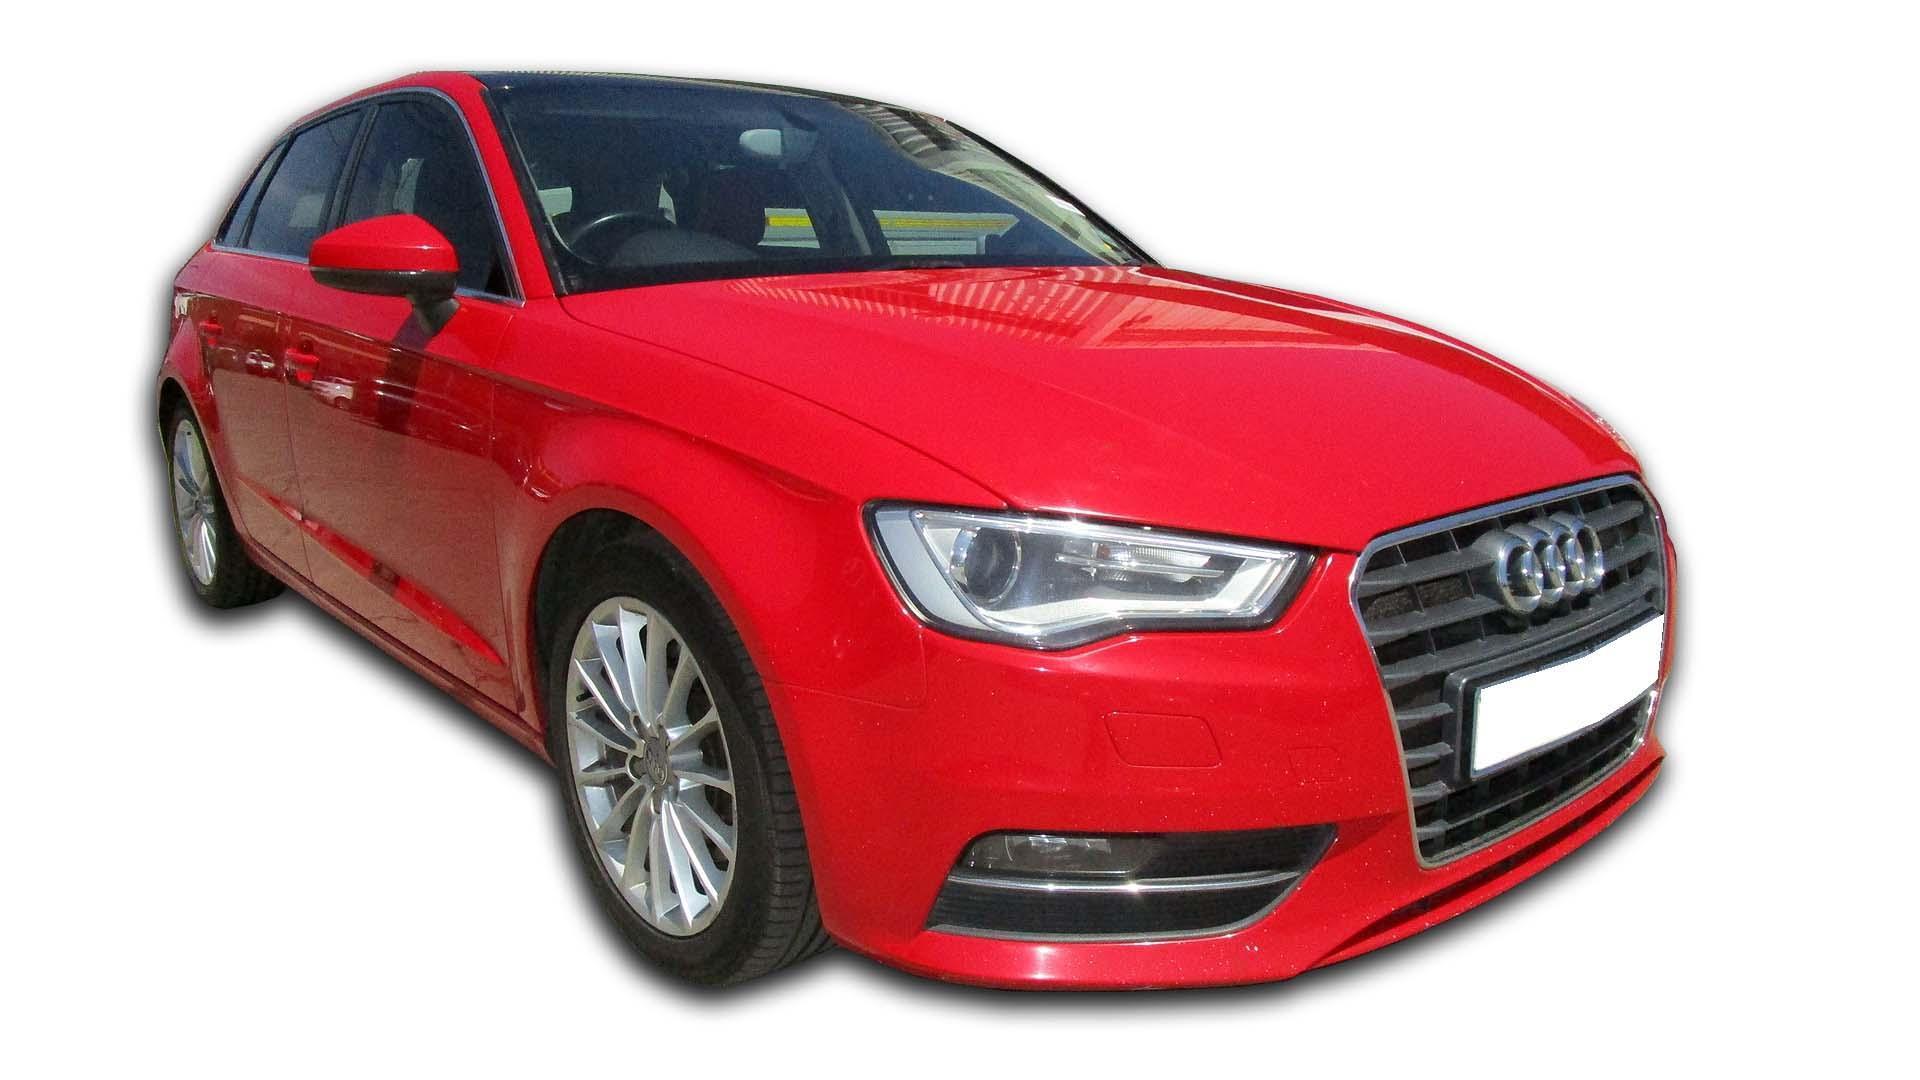 Audi A3 Sportback 1.8T Fsi